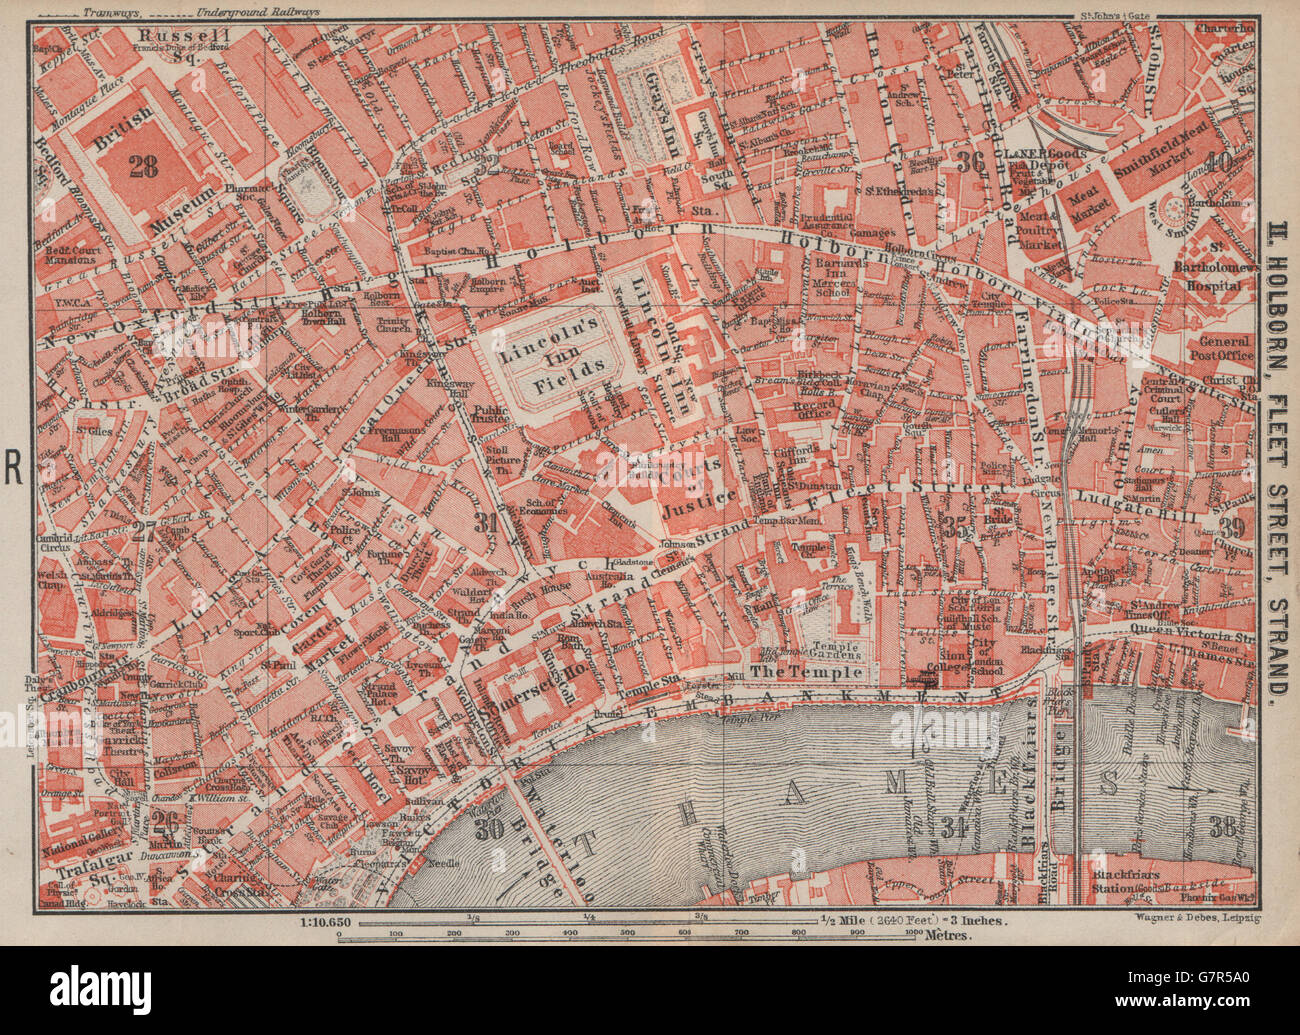 London Street Map 19th Century Stock Photos London Street Map 19th